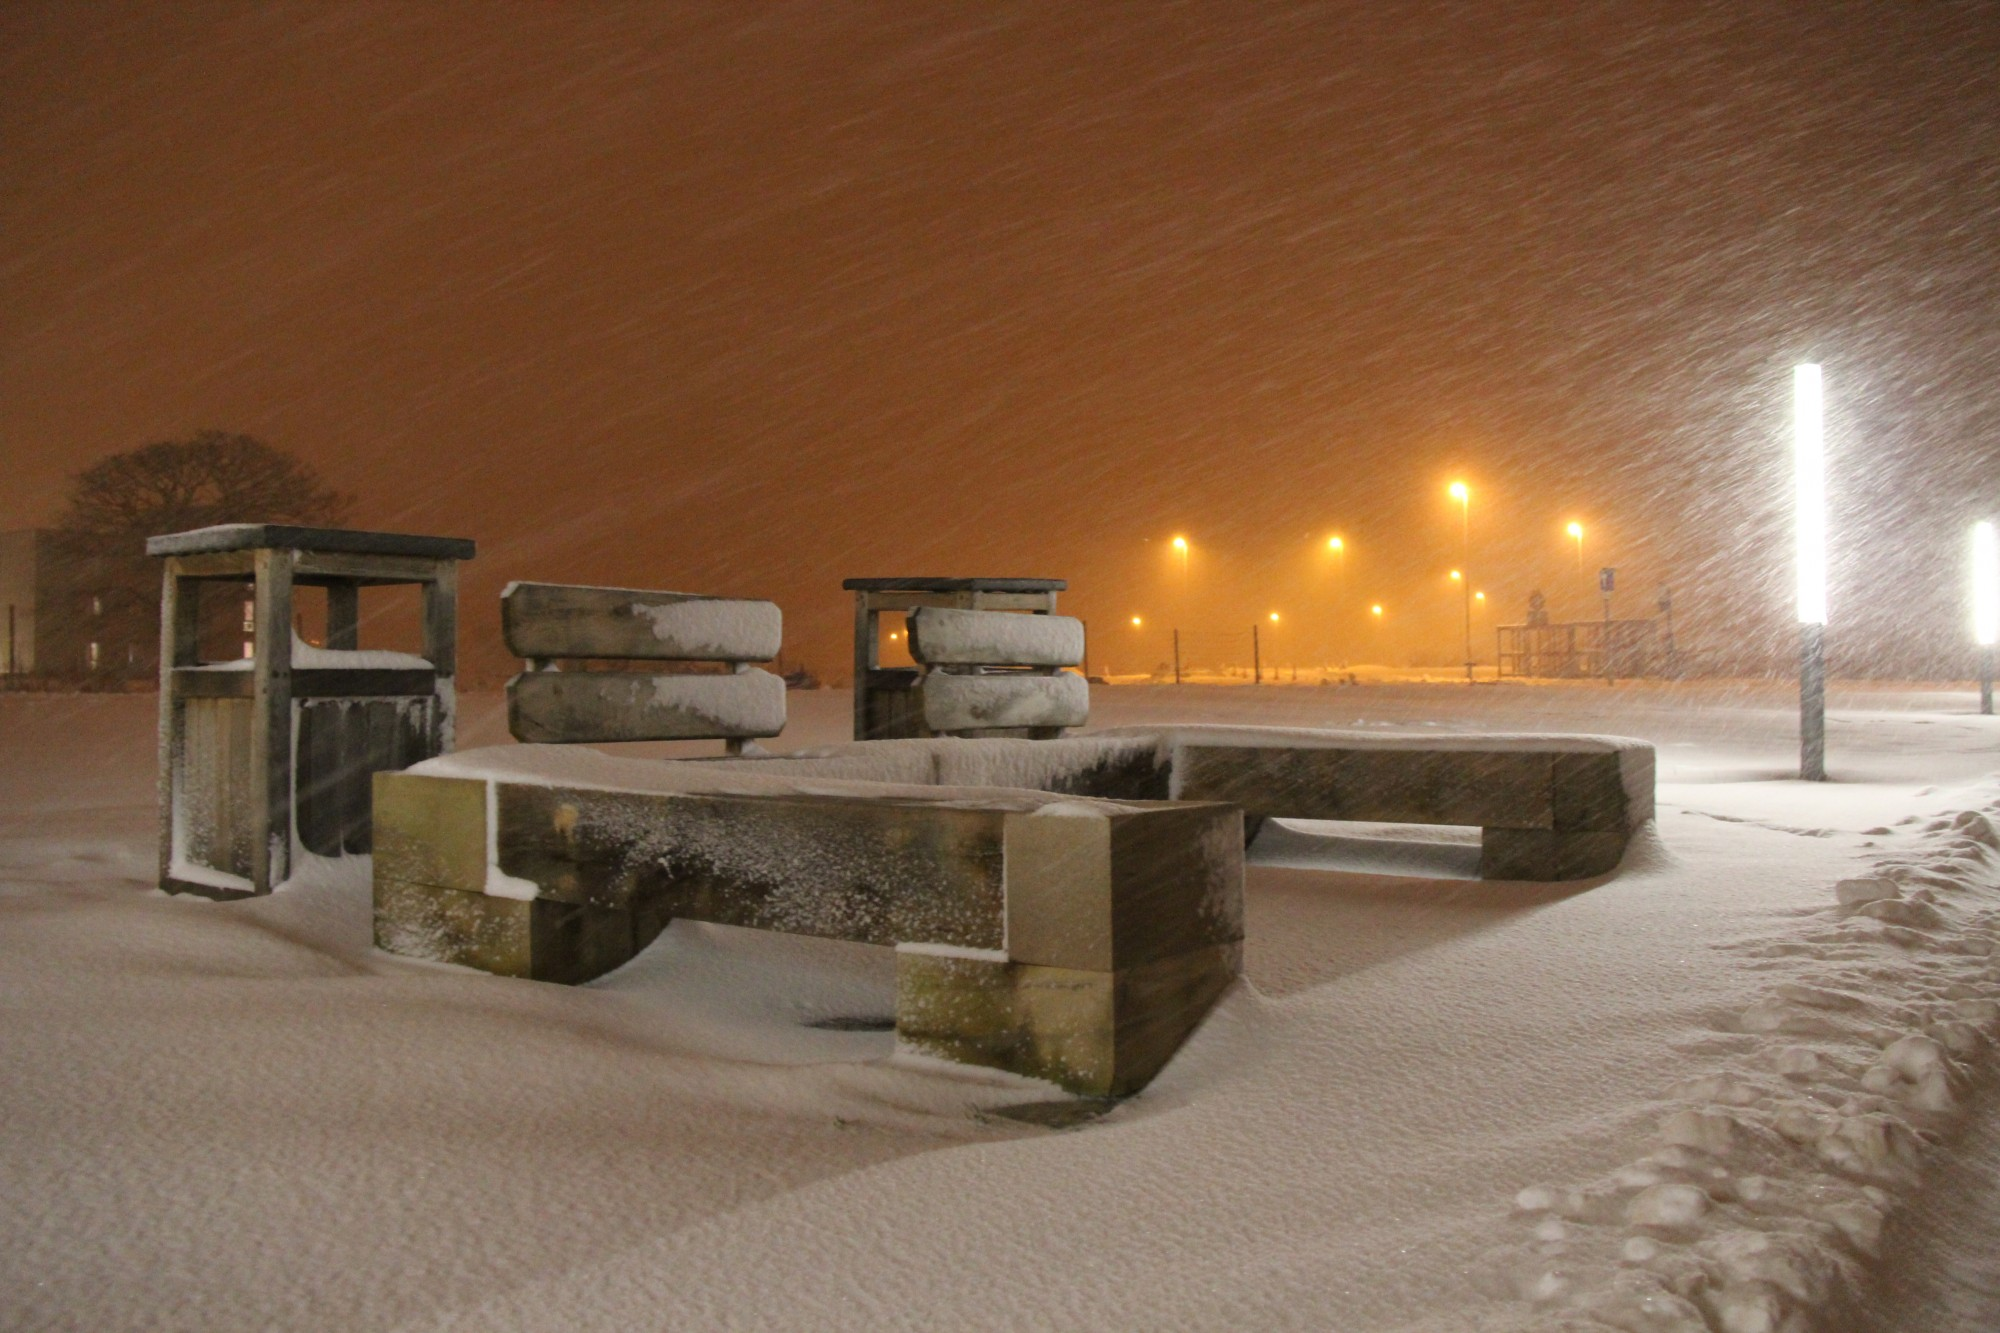 A Snowy Bench in York